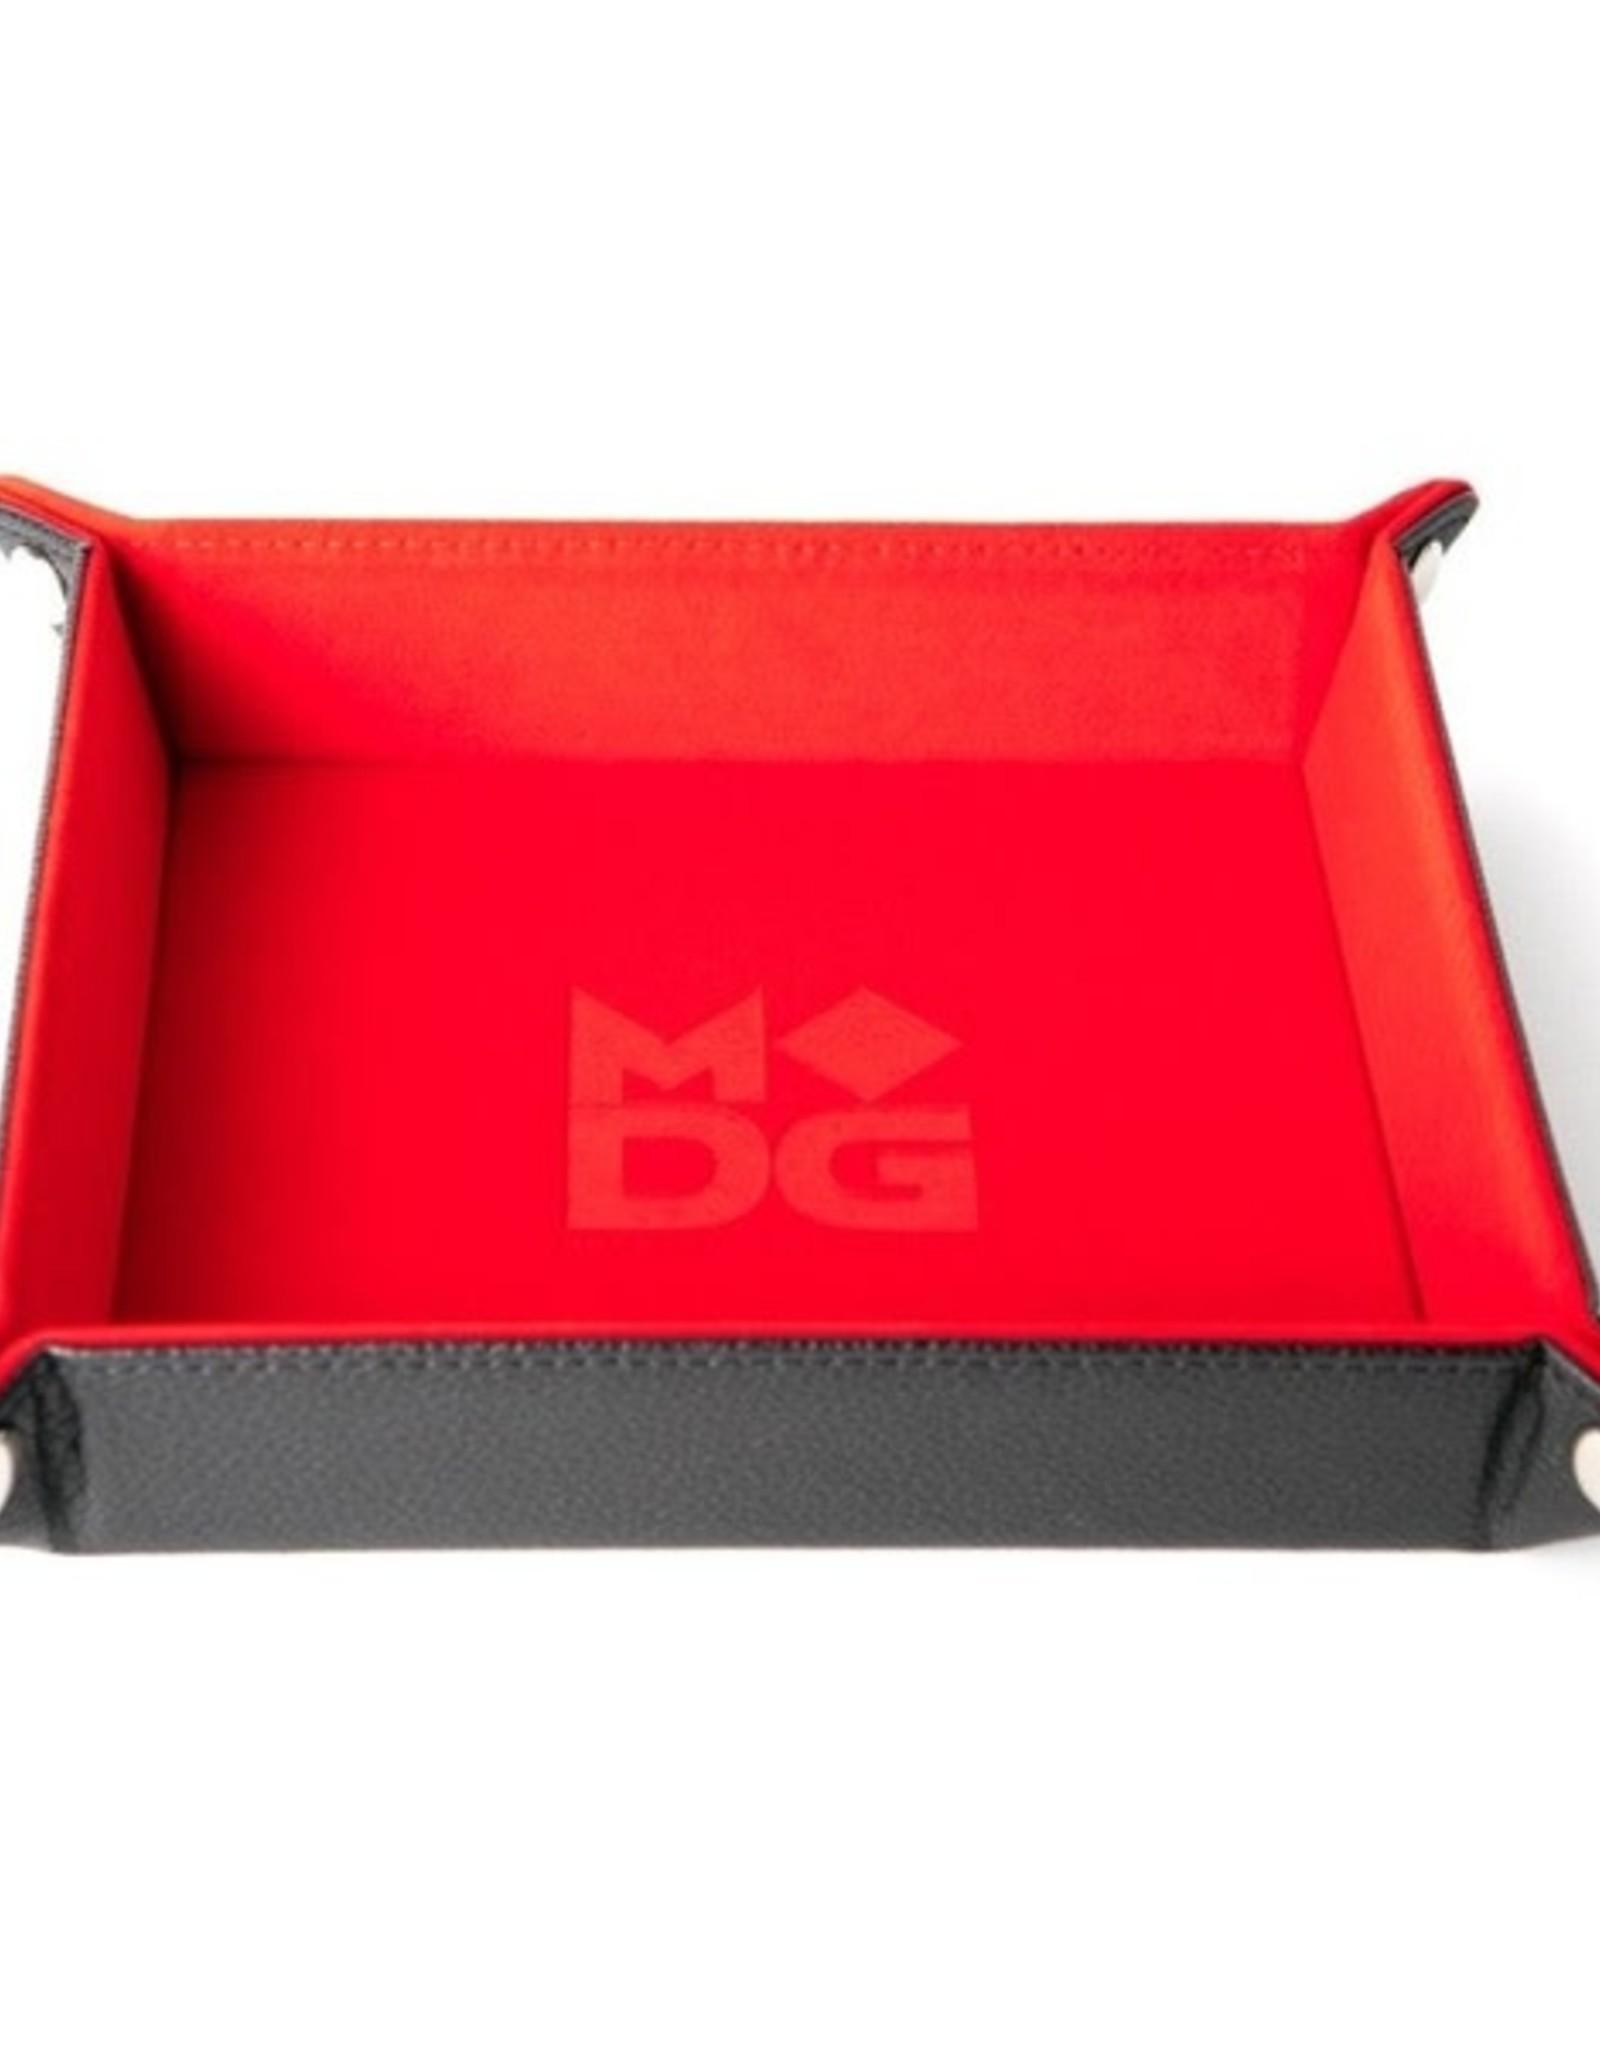 Metallic Dice Games Folding Dice Tray Red Velvet